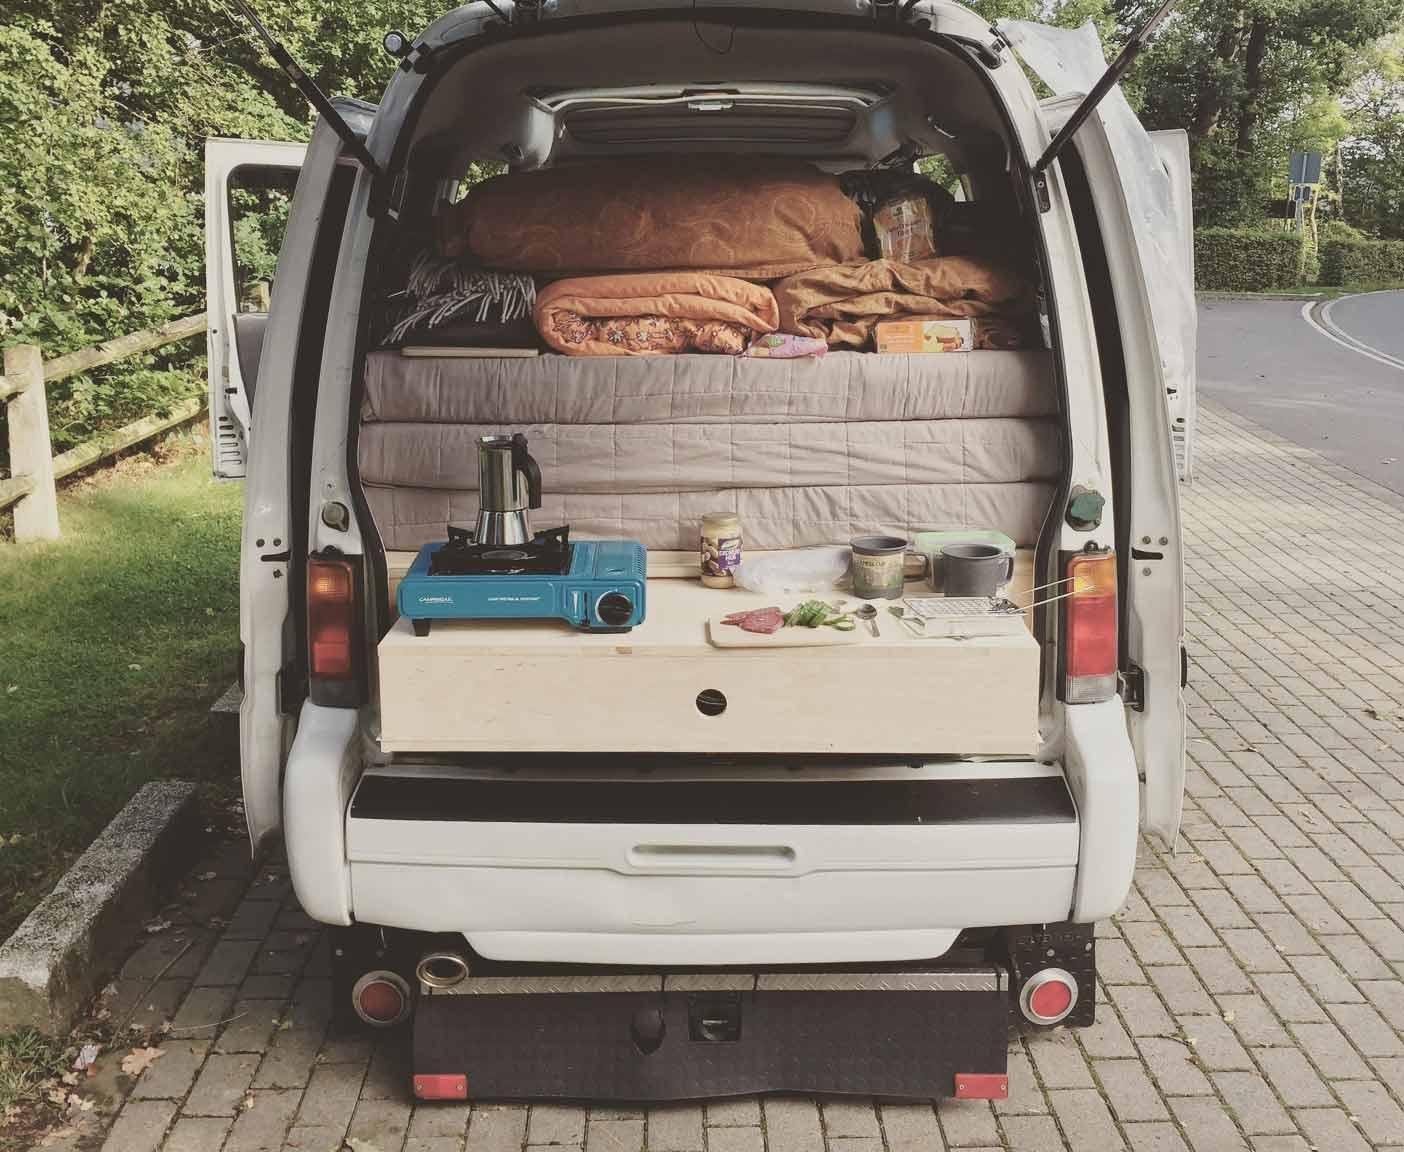 subaru-libero-wohnmobil-umbau-e10-4x4-allrad-camper-minicamper-daihatsu-hijet-piaggio-porter-10